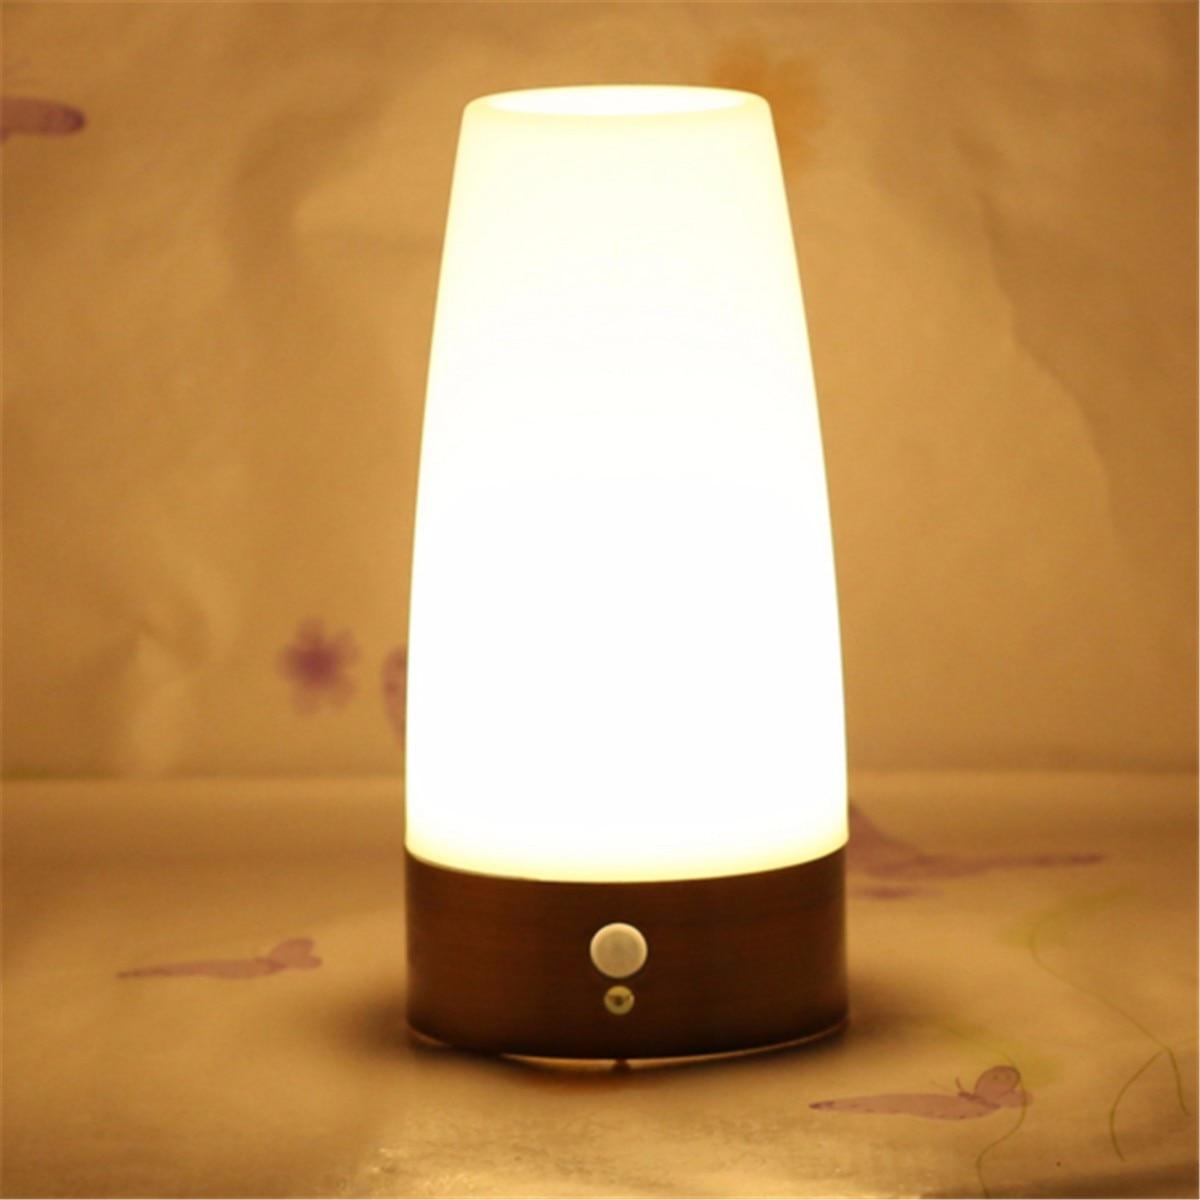 Jiguoor Wireless Led Night Light Table Bed Lamp Motion